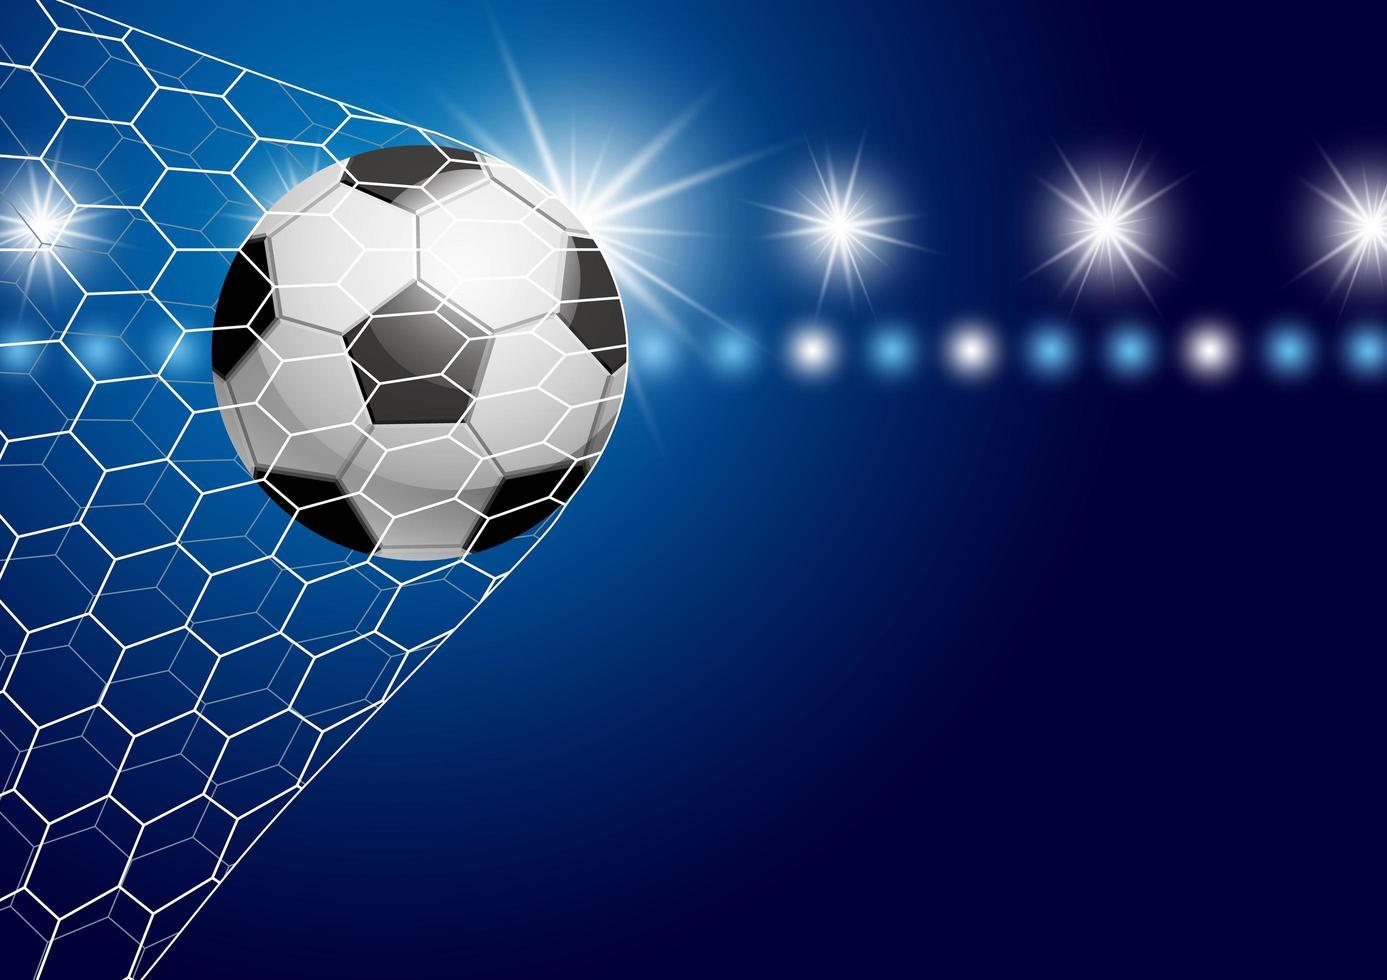 Fußball im Tor auf blau vektor